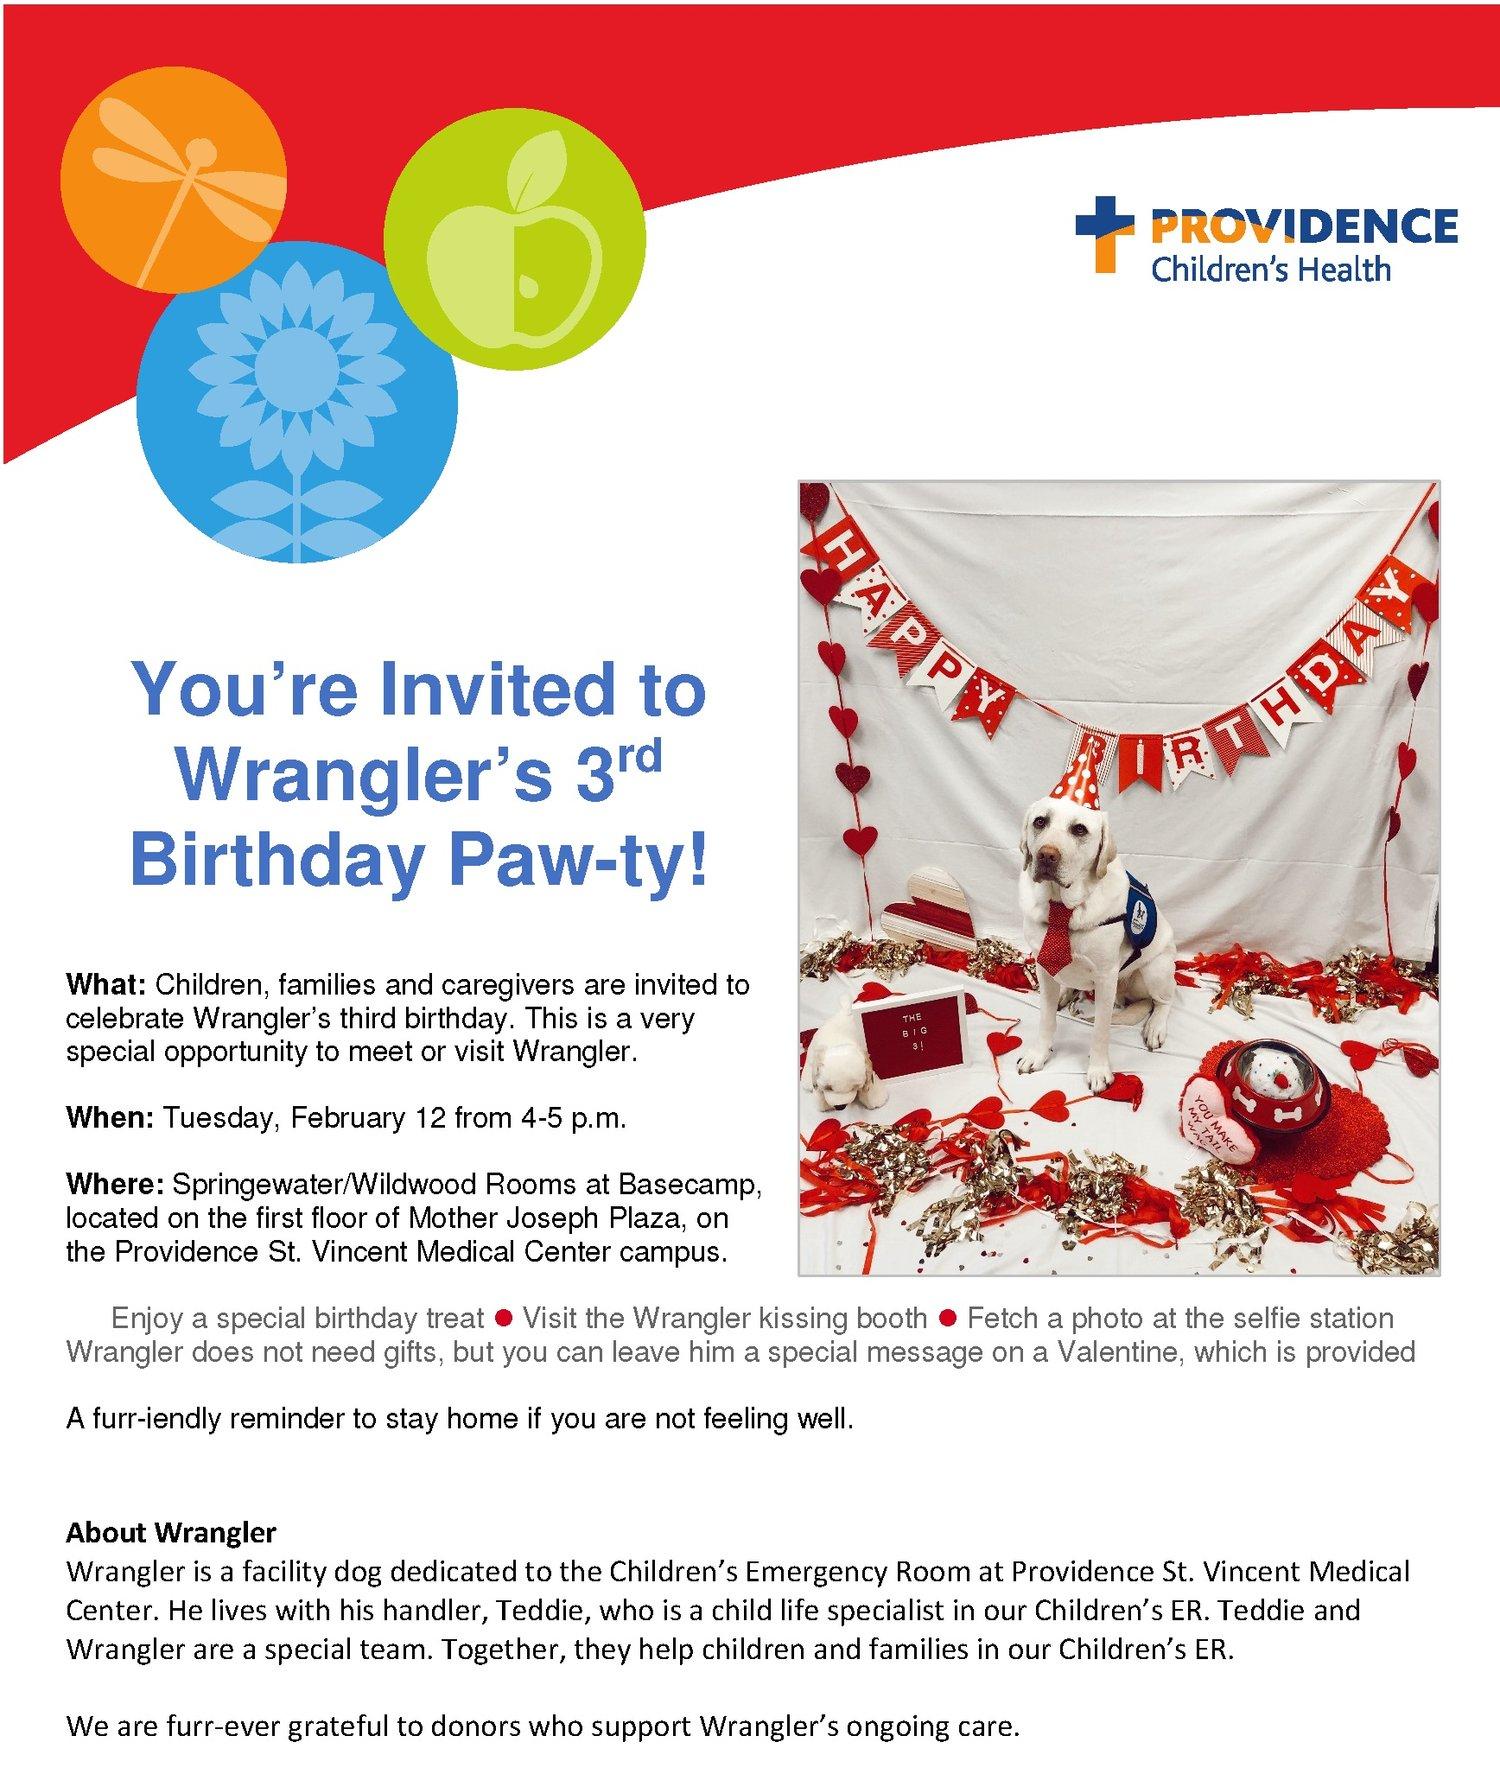 Wrangler's Birthday Paw-ty! — Basecamp